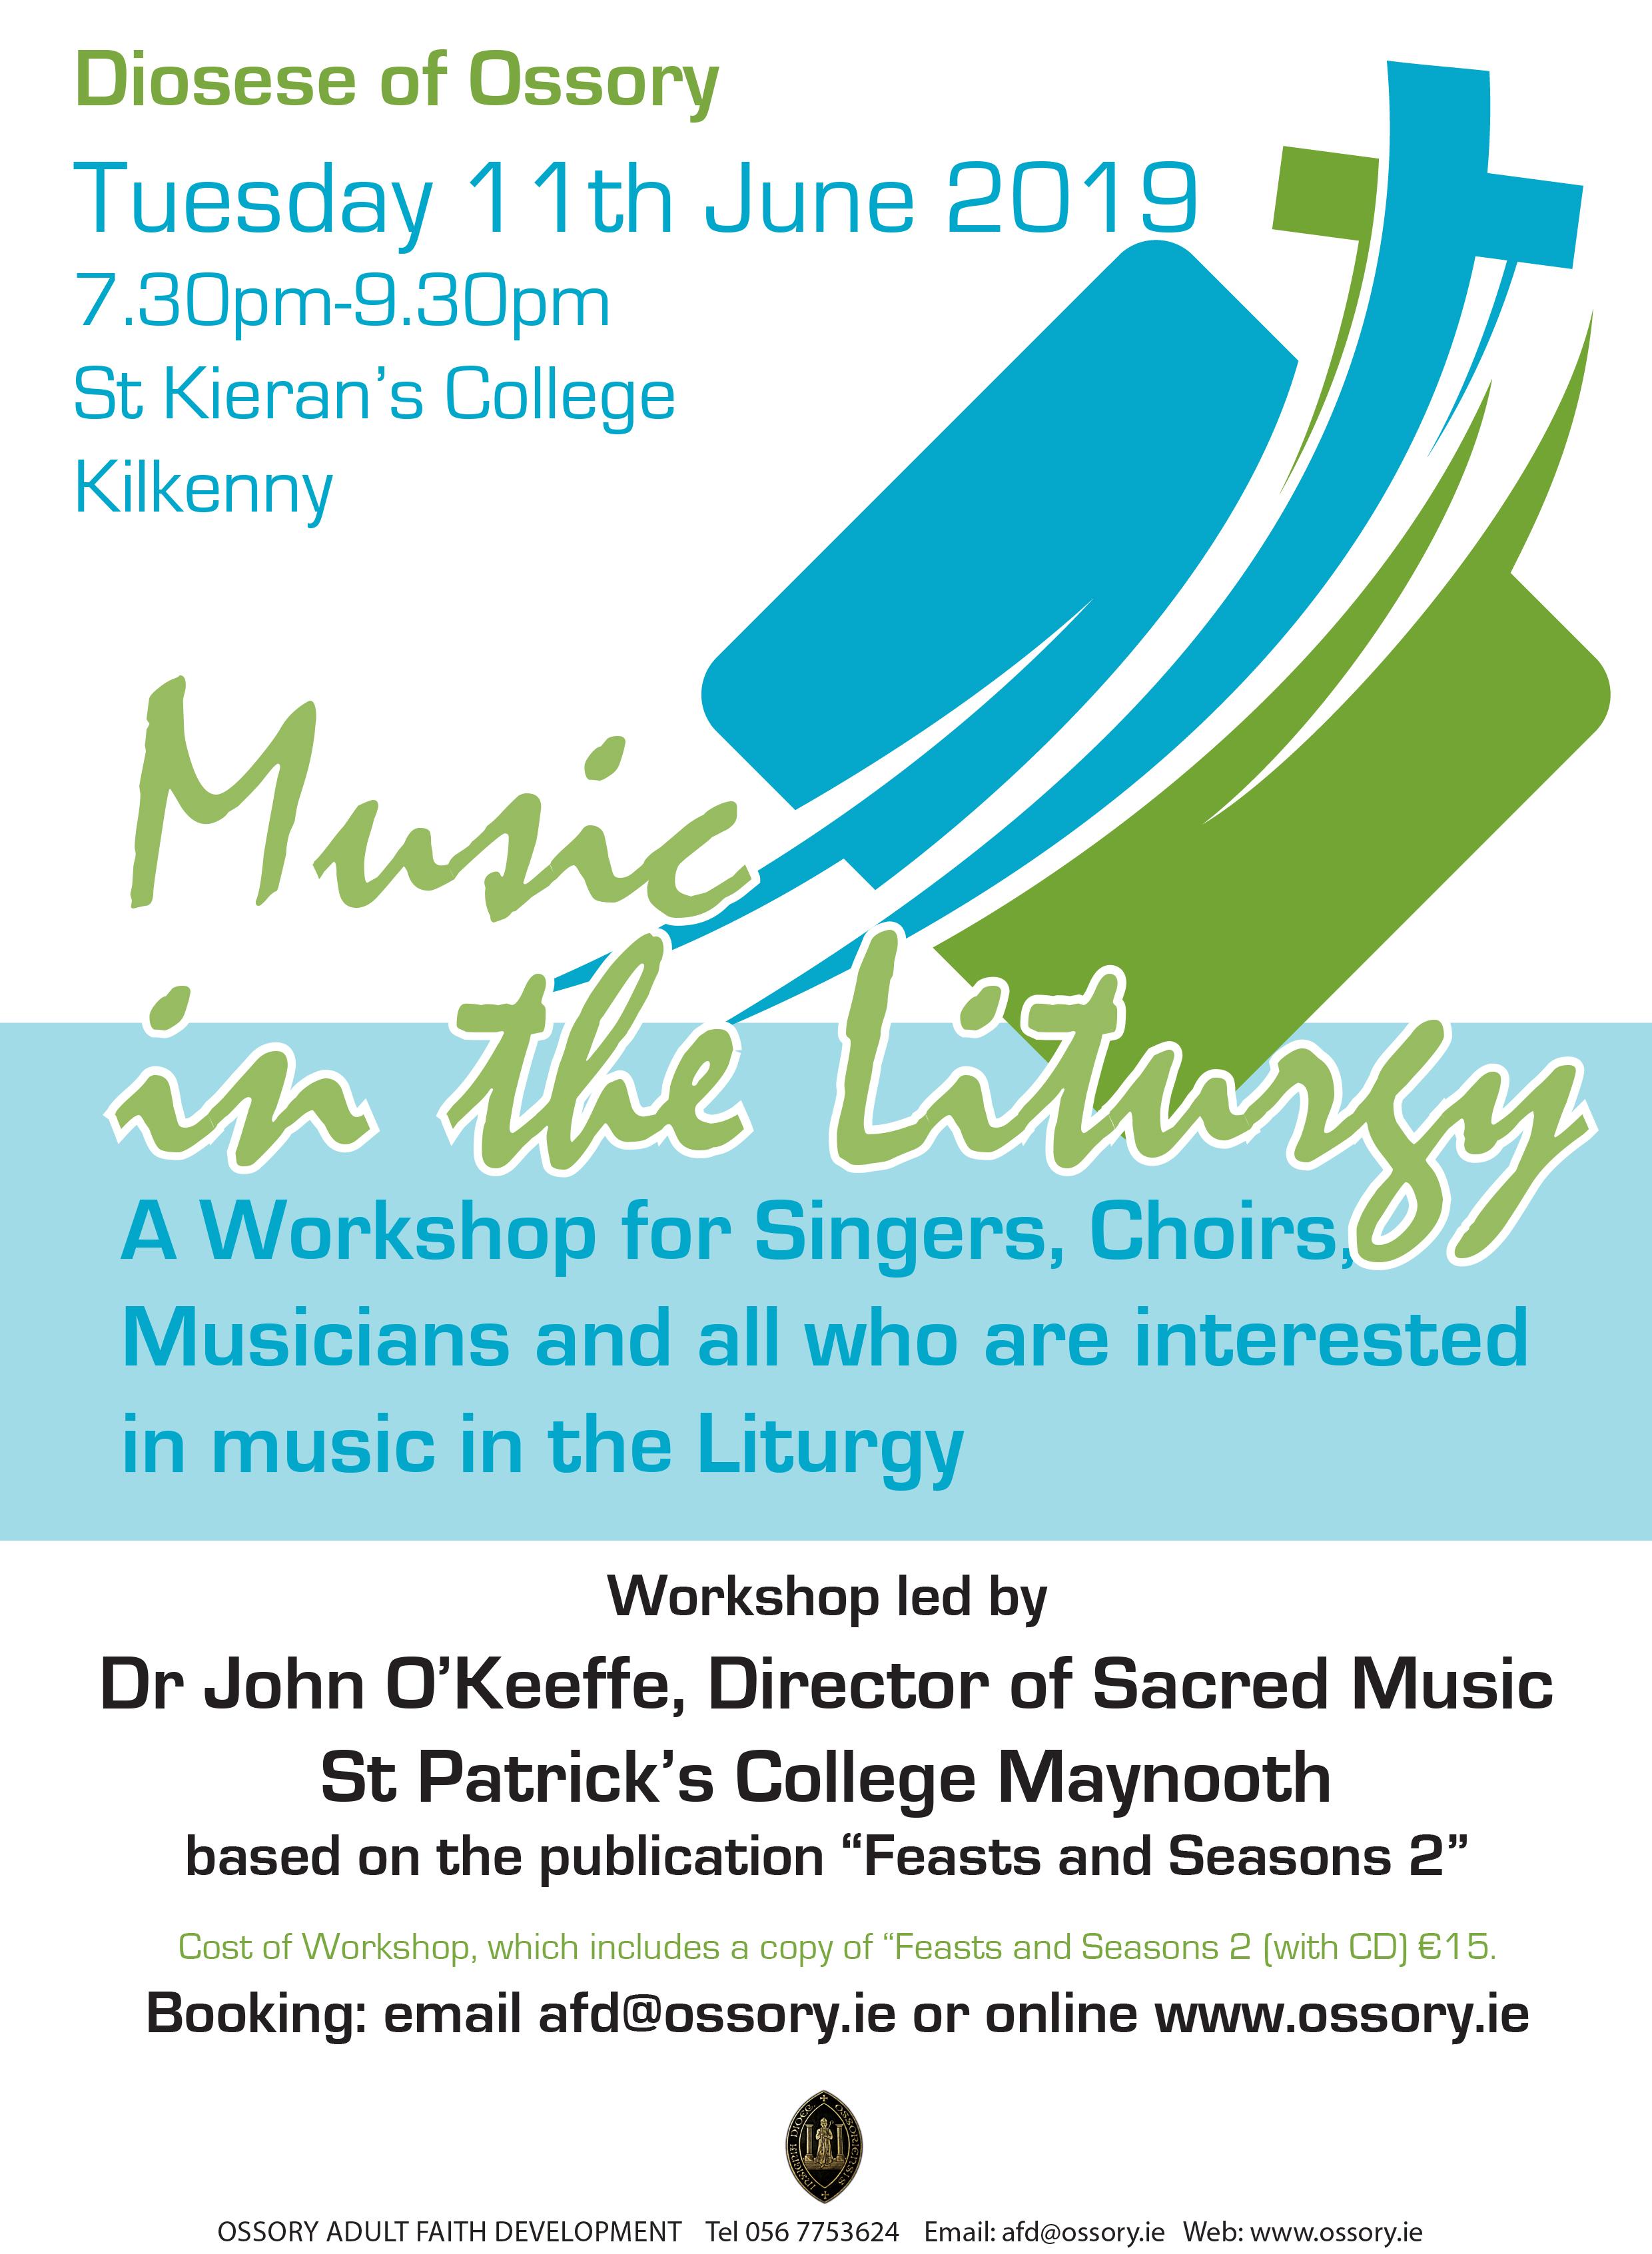 Music in the Liturgy @ St Kieran's College